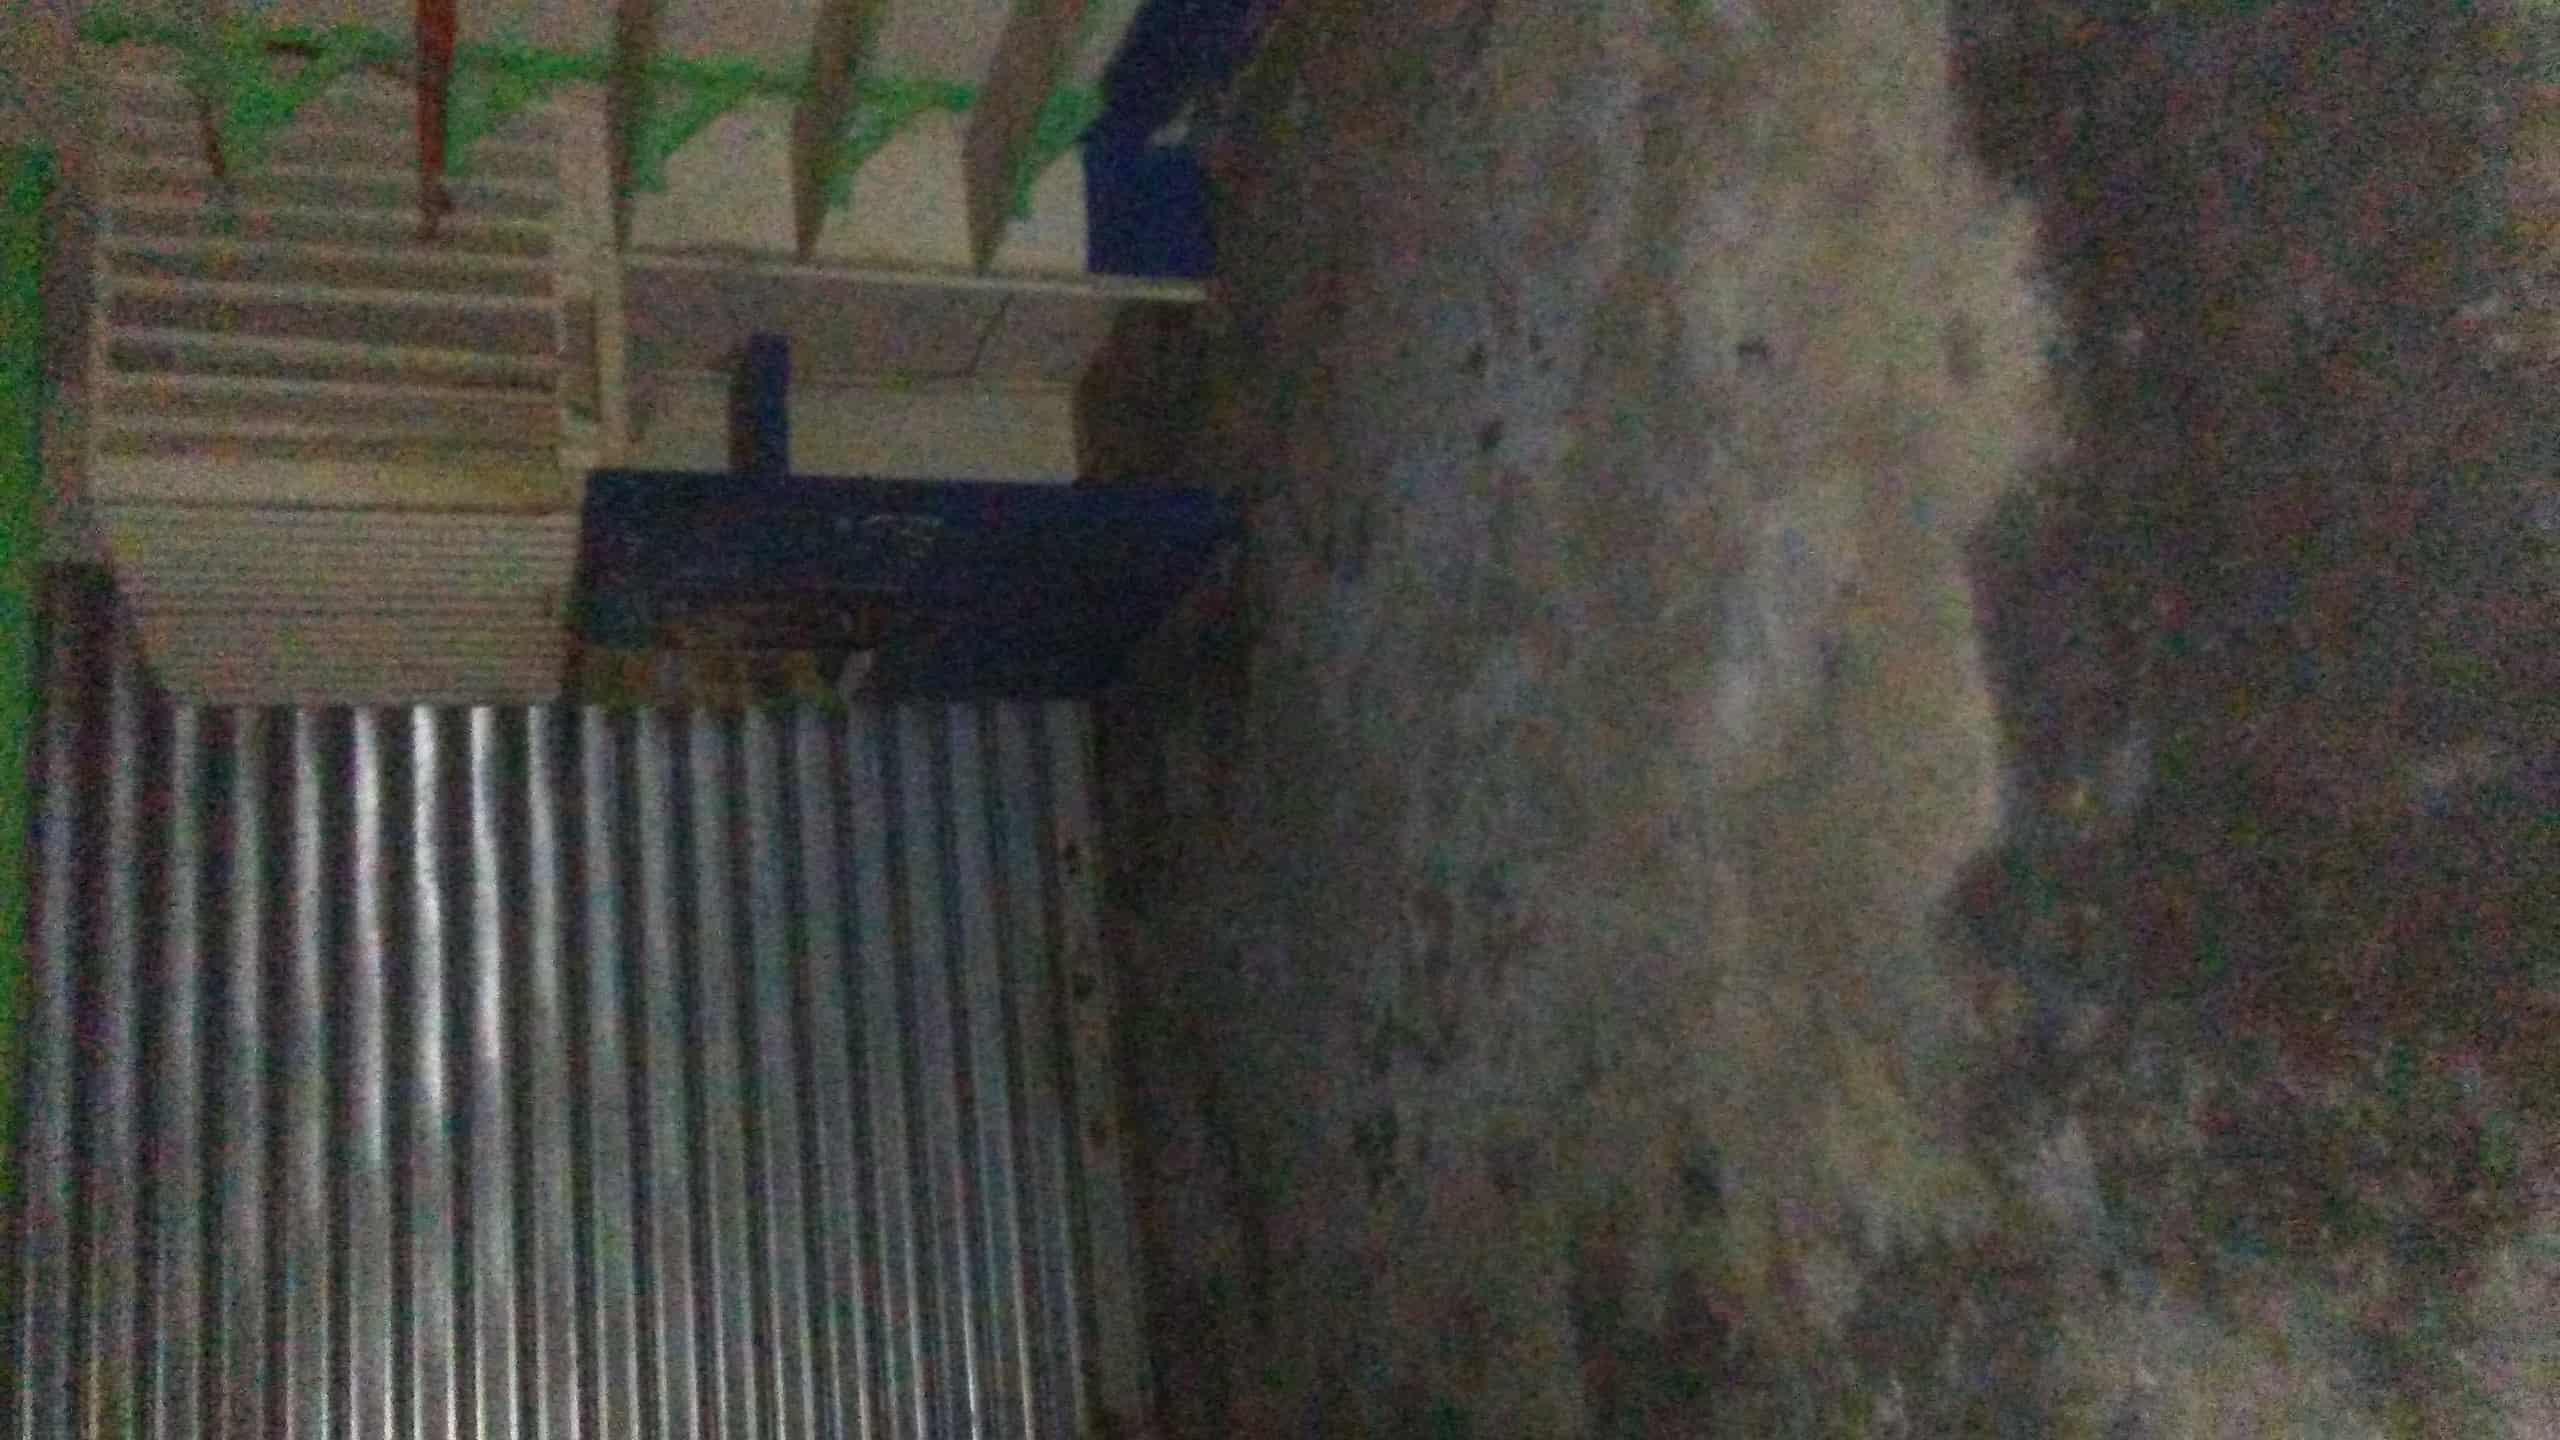 Shop to rent at Douala, Bepanda, Face texaco omnisport..bordure de route - 75 m2 - 150 000 FCFA